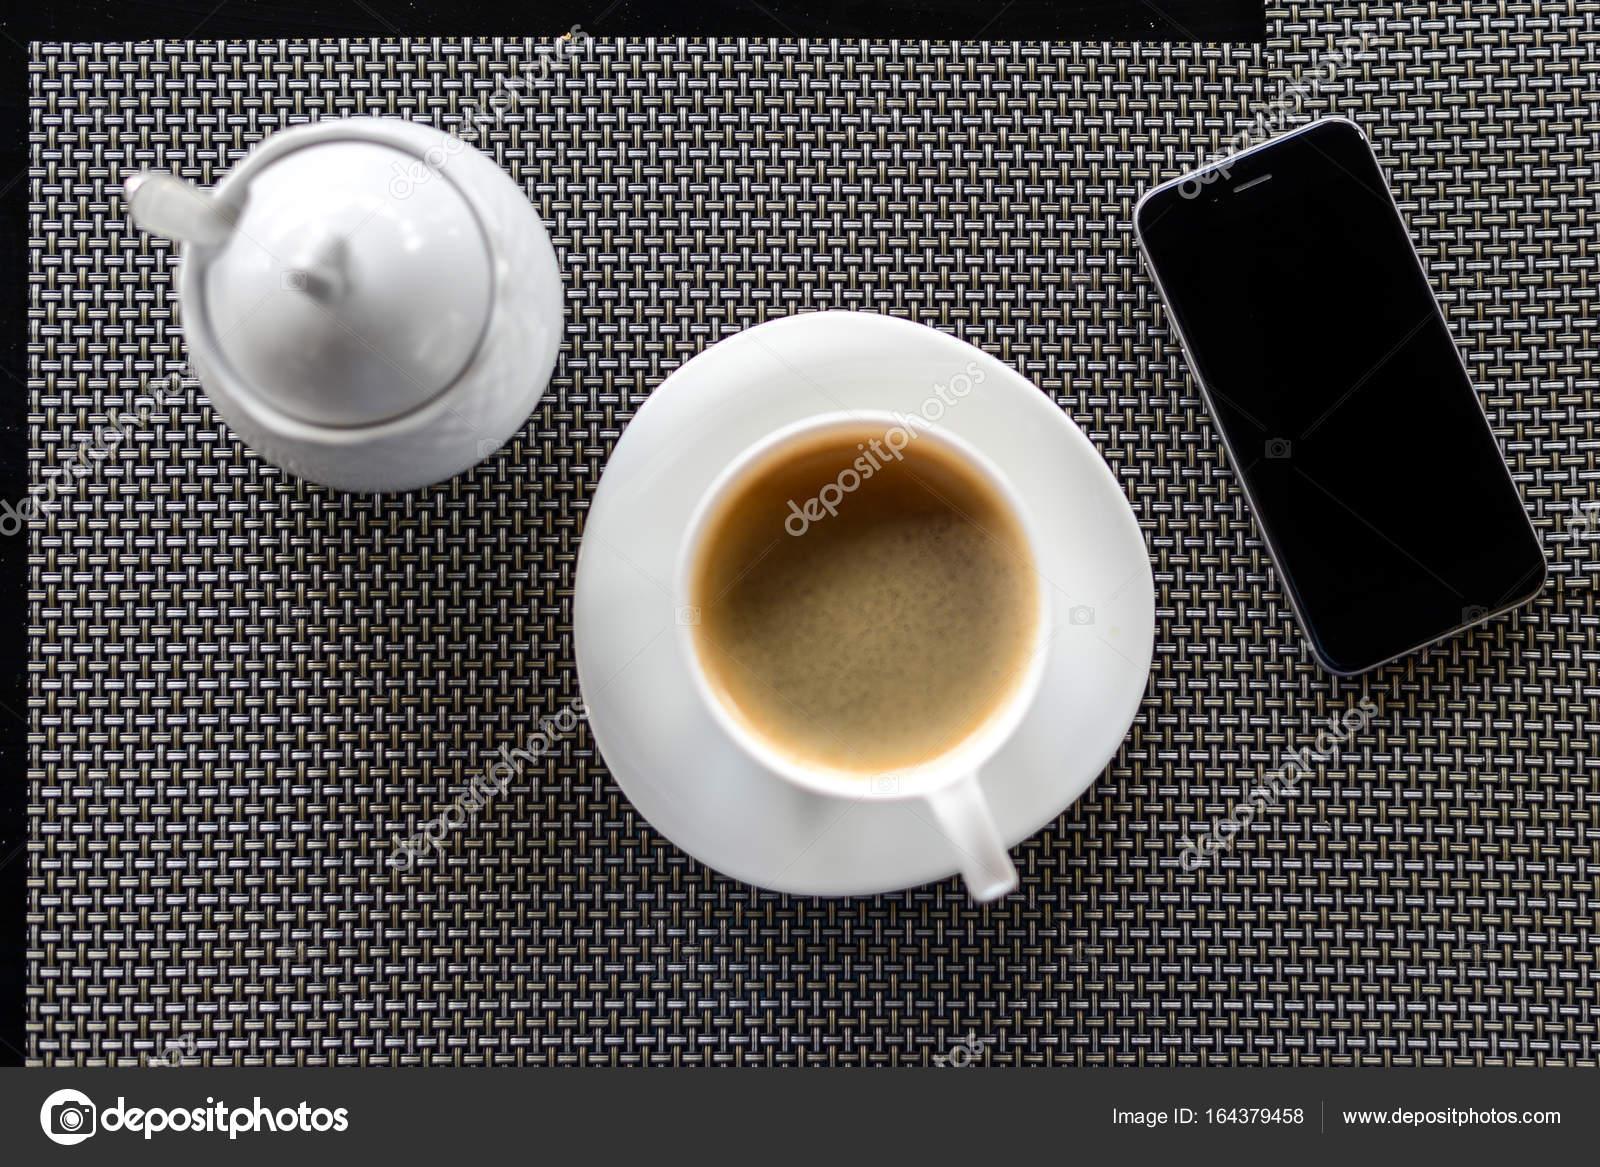 Caffè sul tavolo di un caffè di estate u2014 foto stock © kadrby #164379458